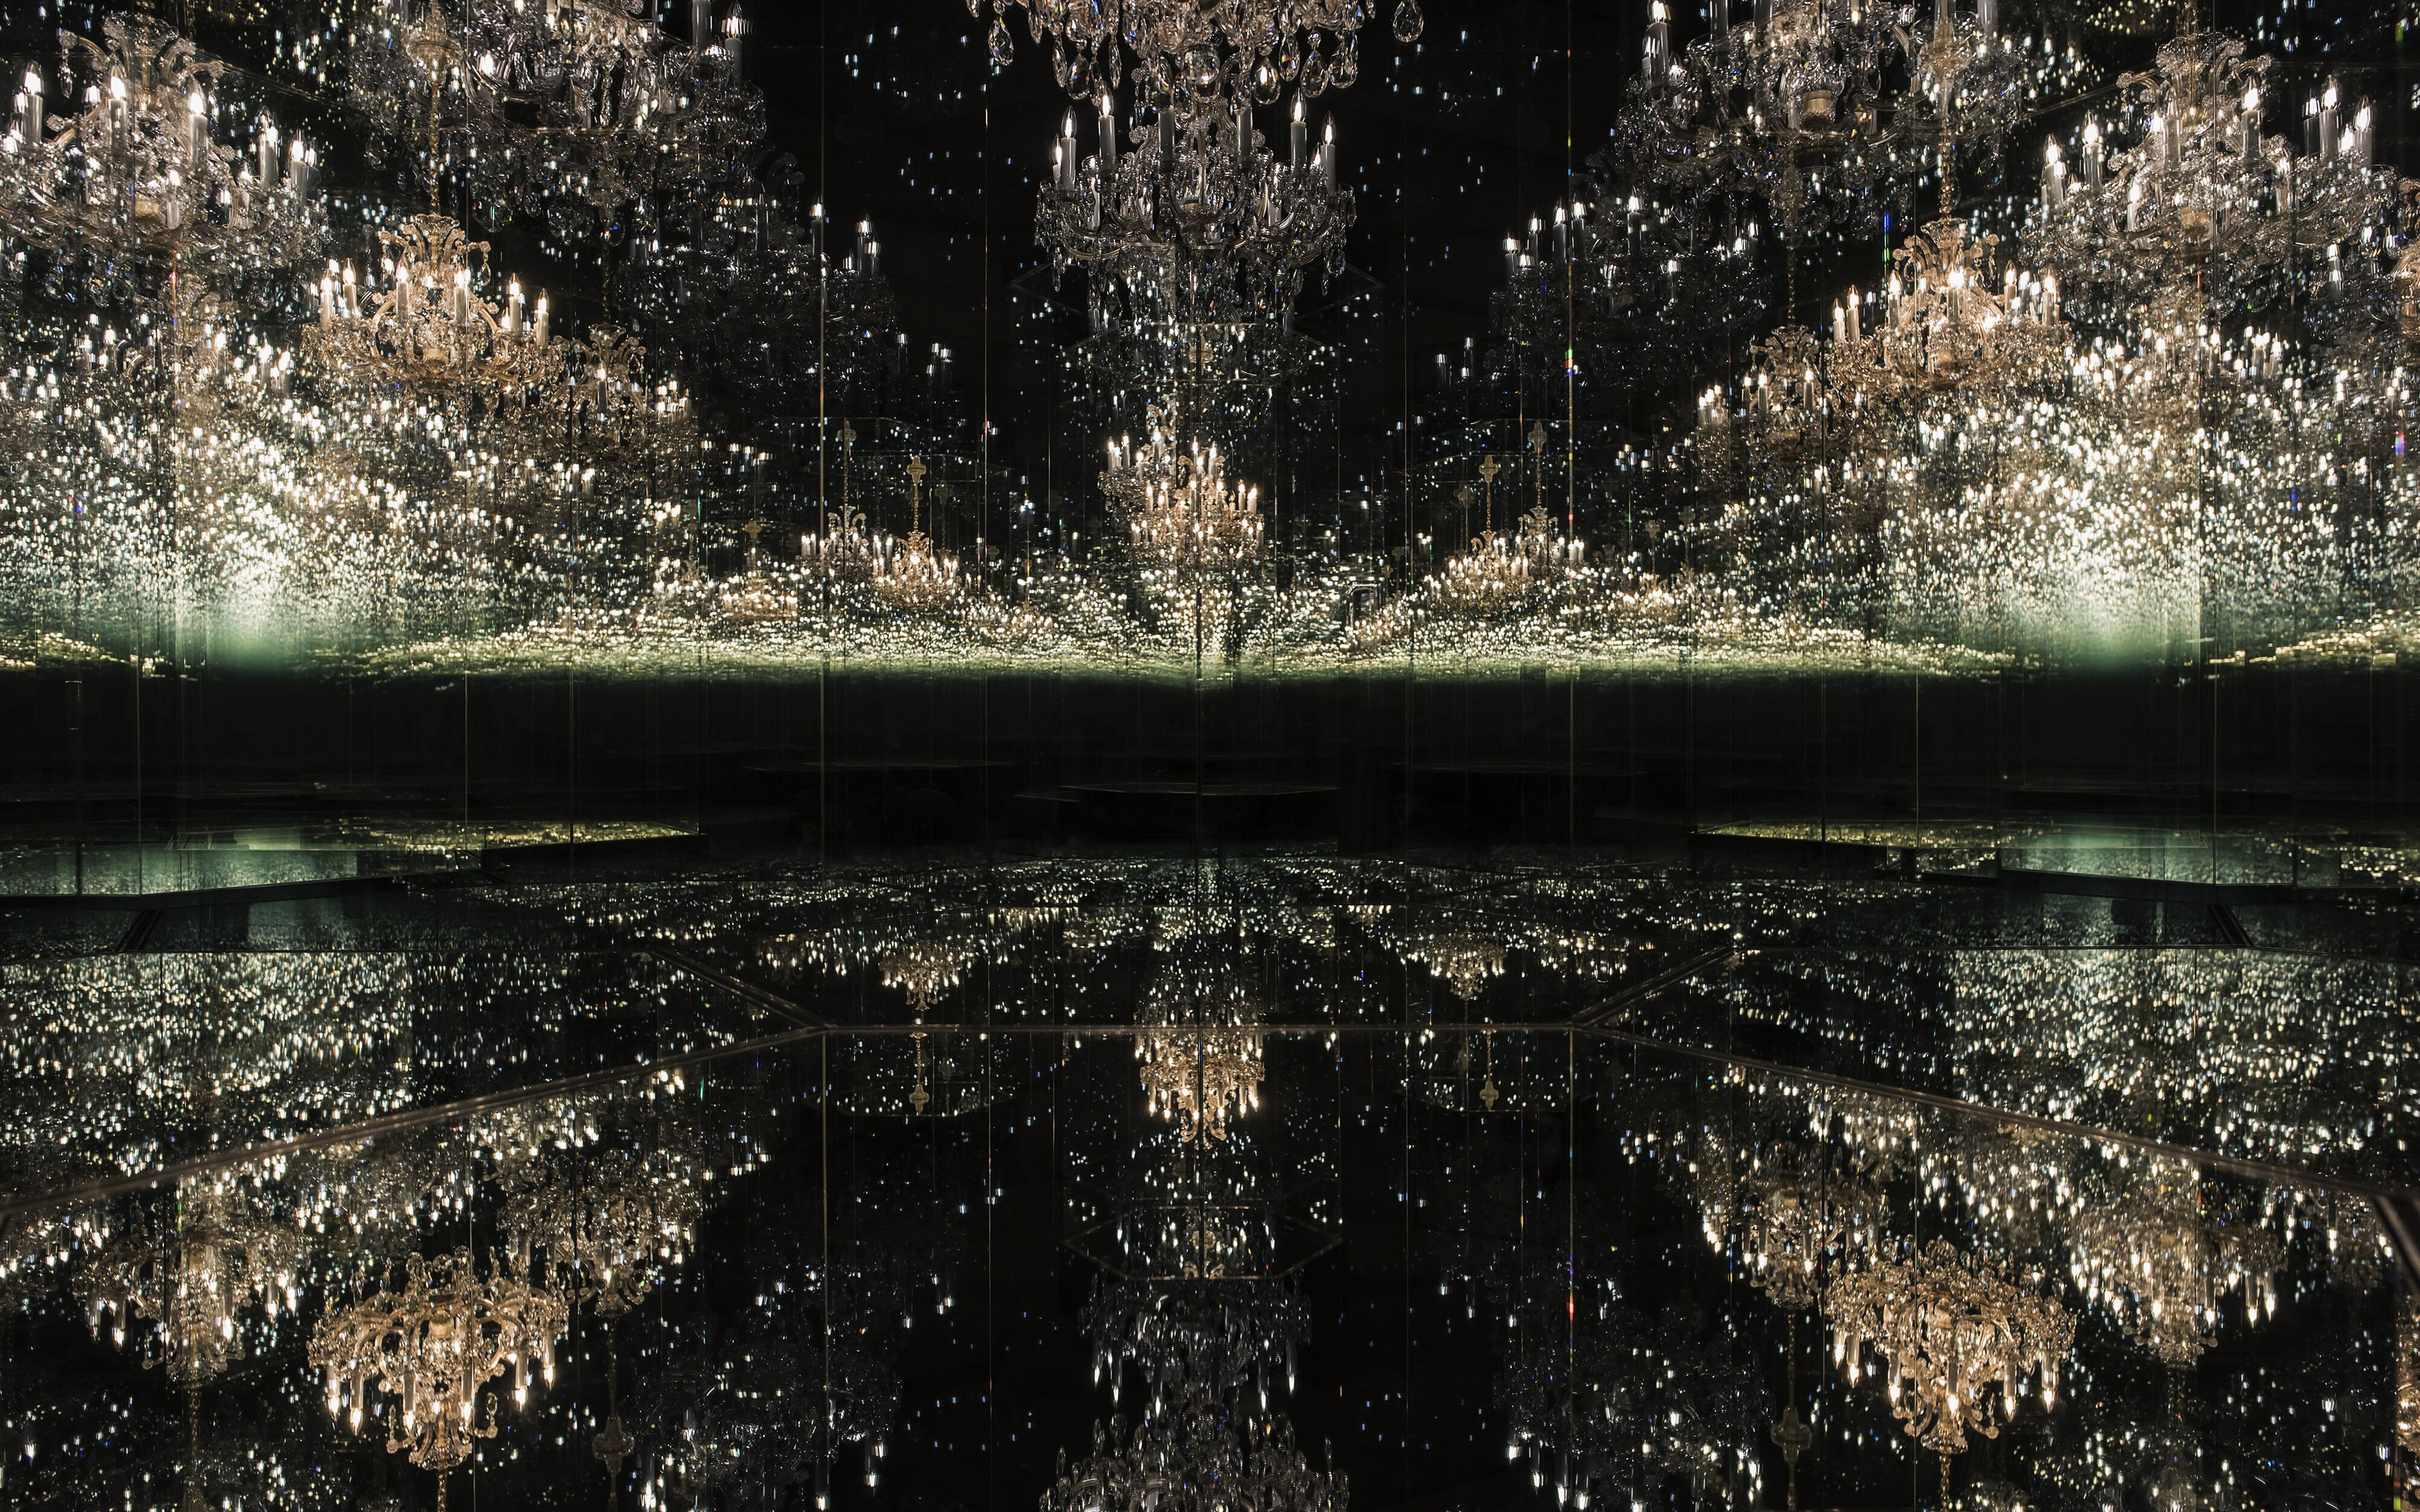 La Tate Modern cumple 20 años y lo celebra con 'Yayoi Kusama: Infinity Rooms'